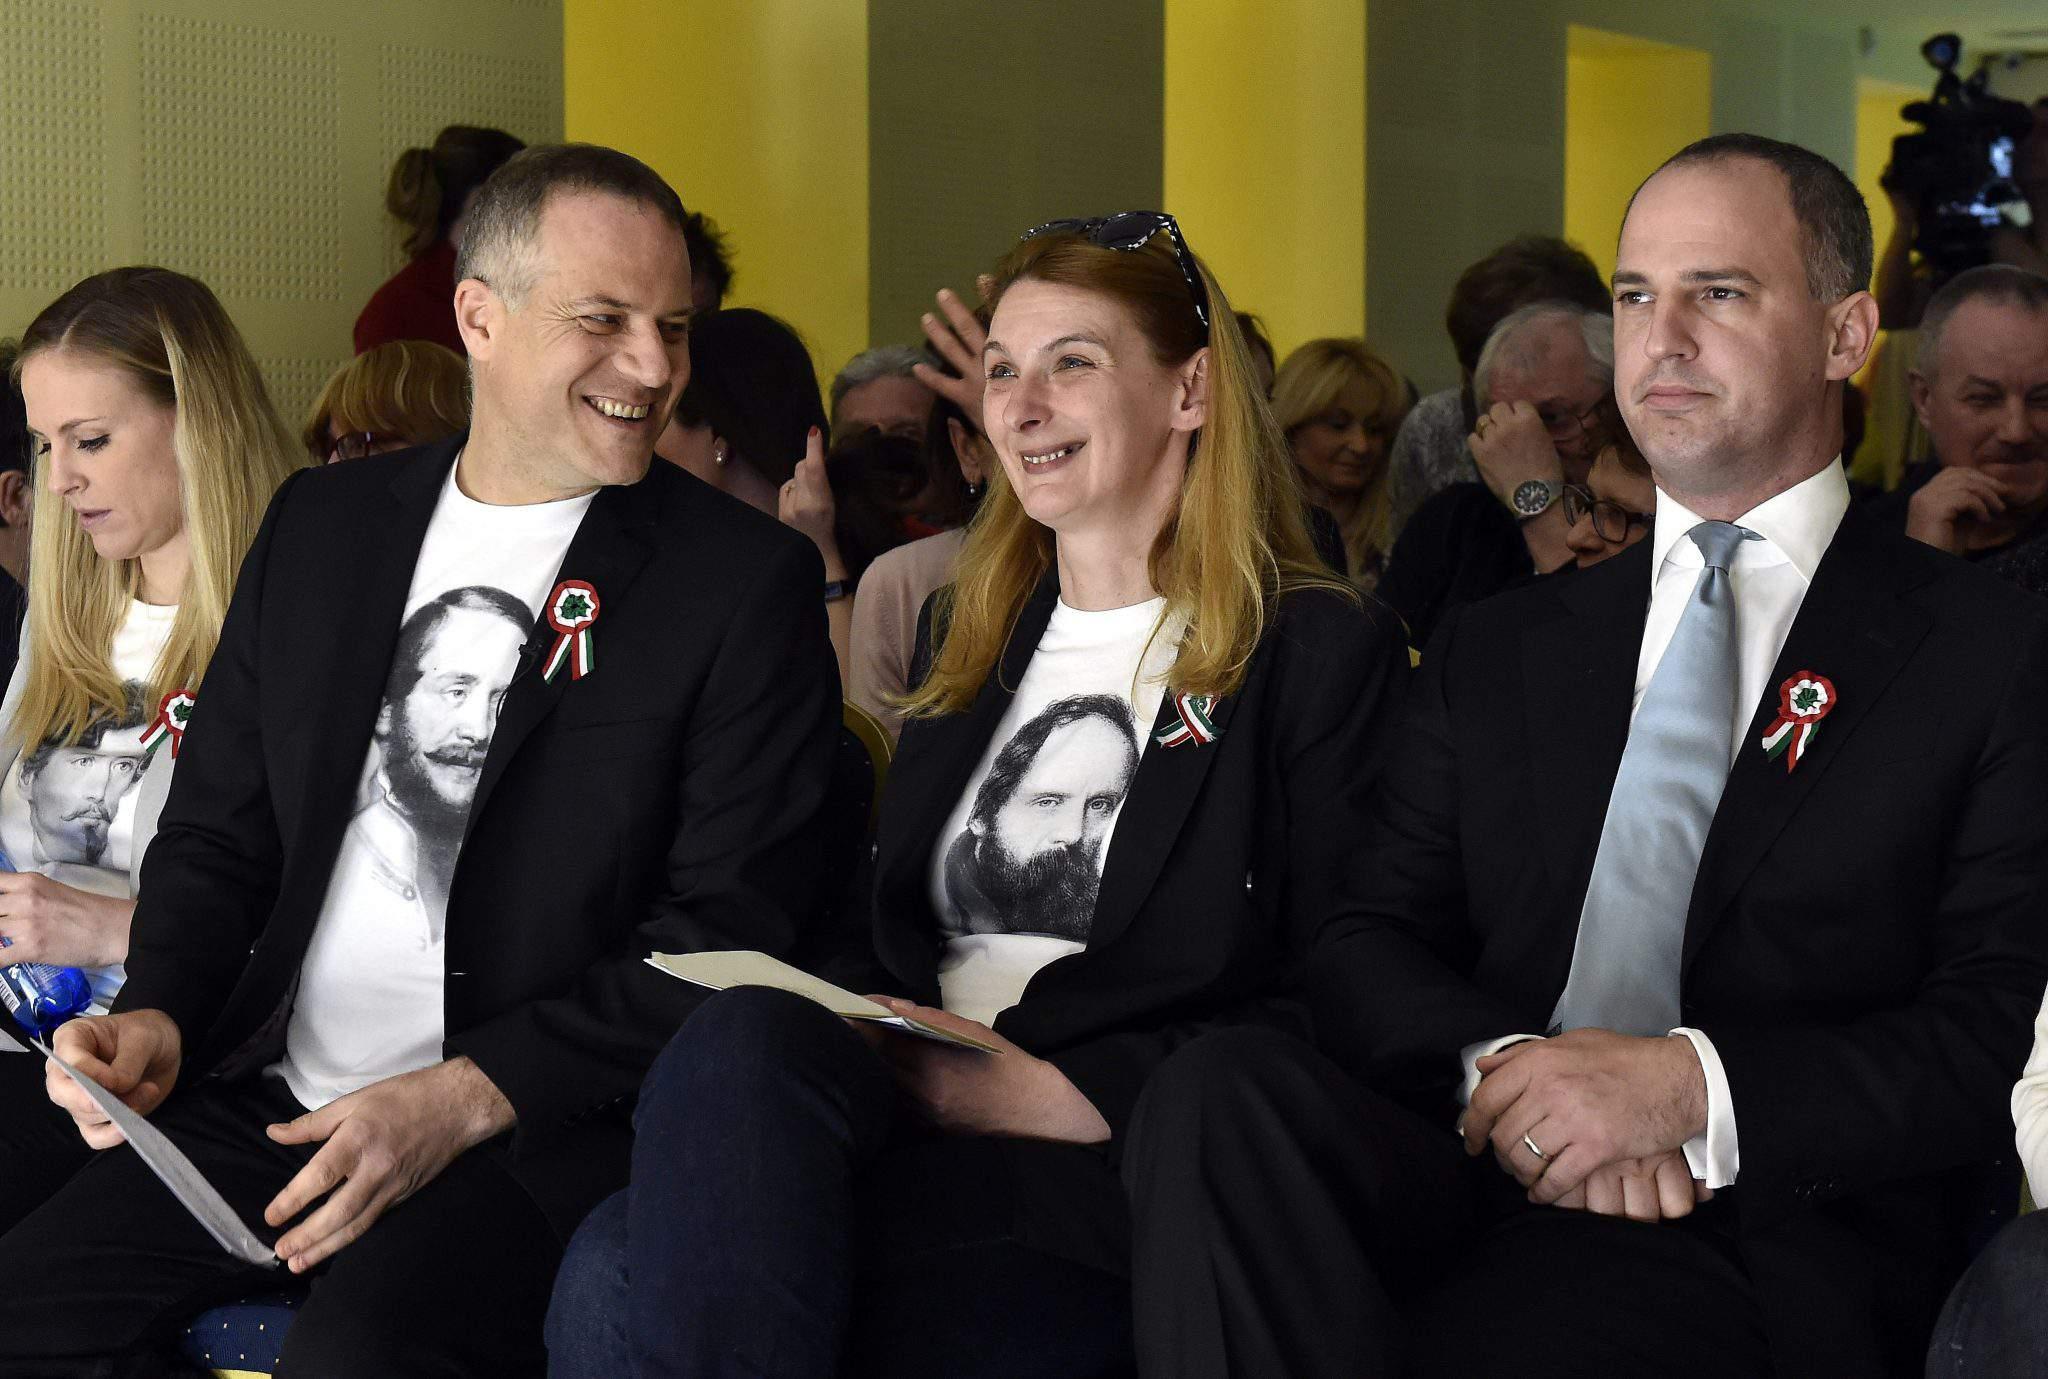 Election 2018 - Együtt head withdraws candidacy